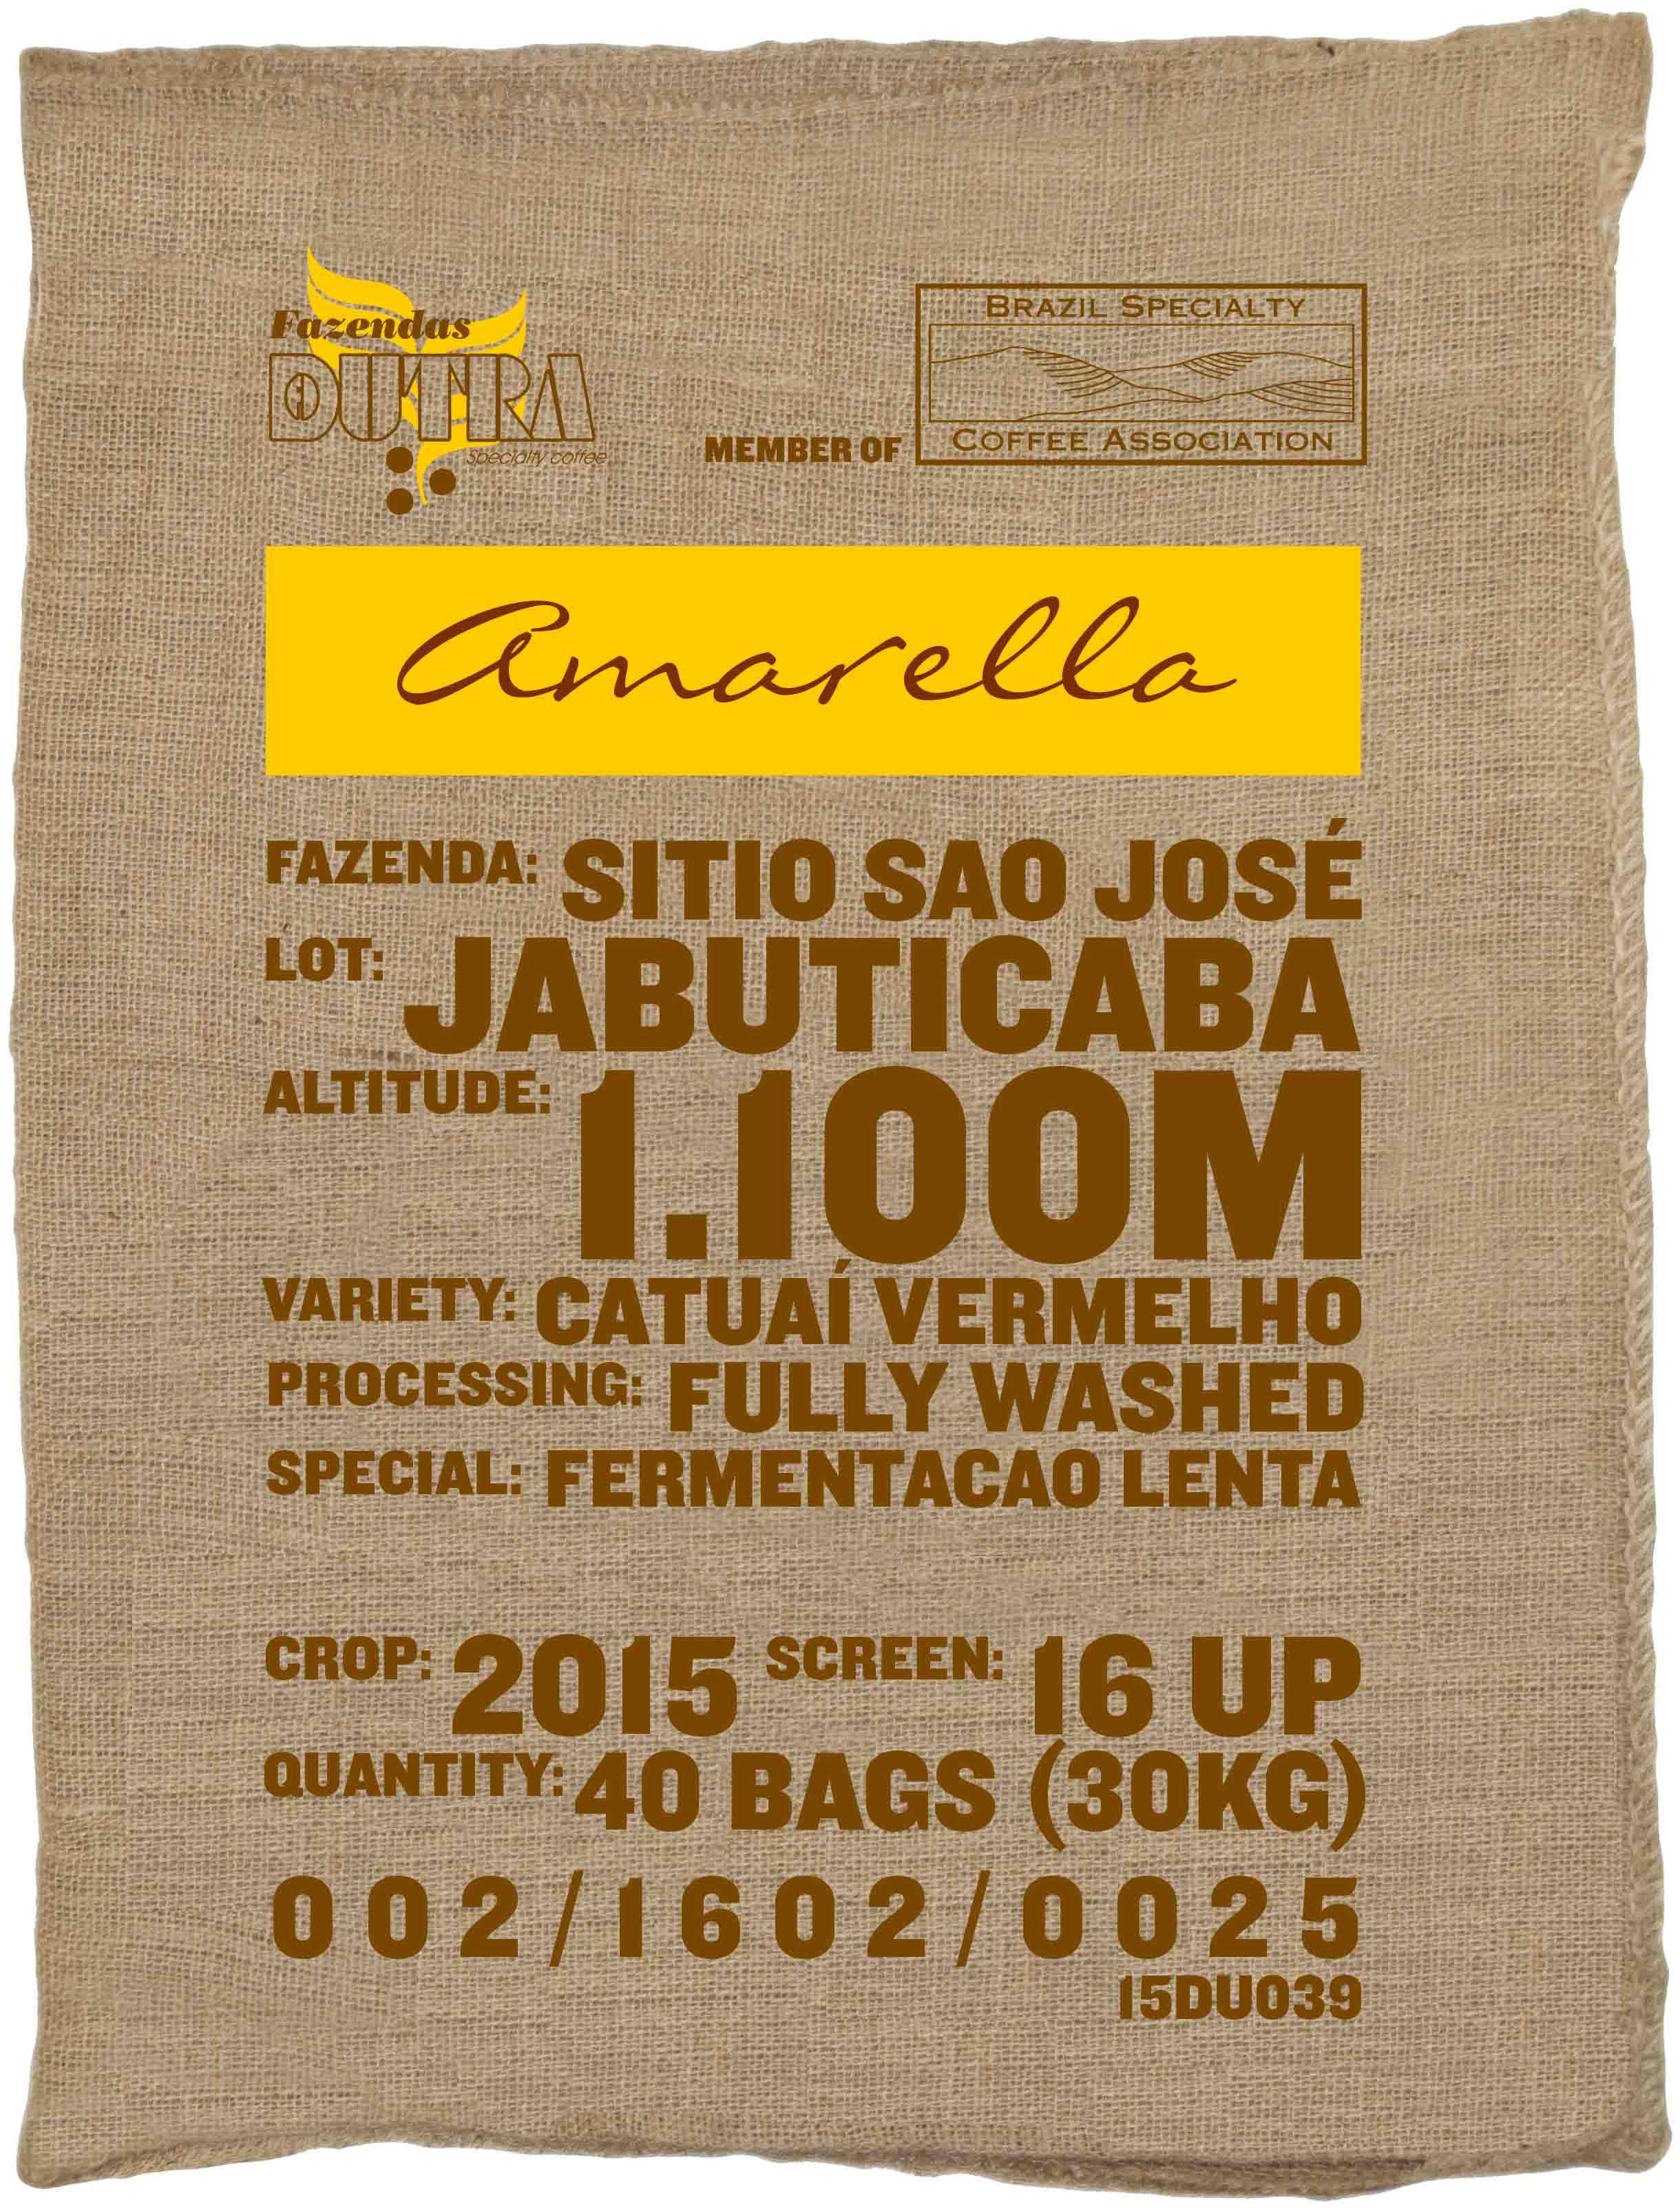 Ein Rohkaffeesack amarella Parzellenkaffee Varietät Catuai vermelho. Fazendas Dutra Lot Jabuticaba.